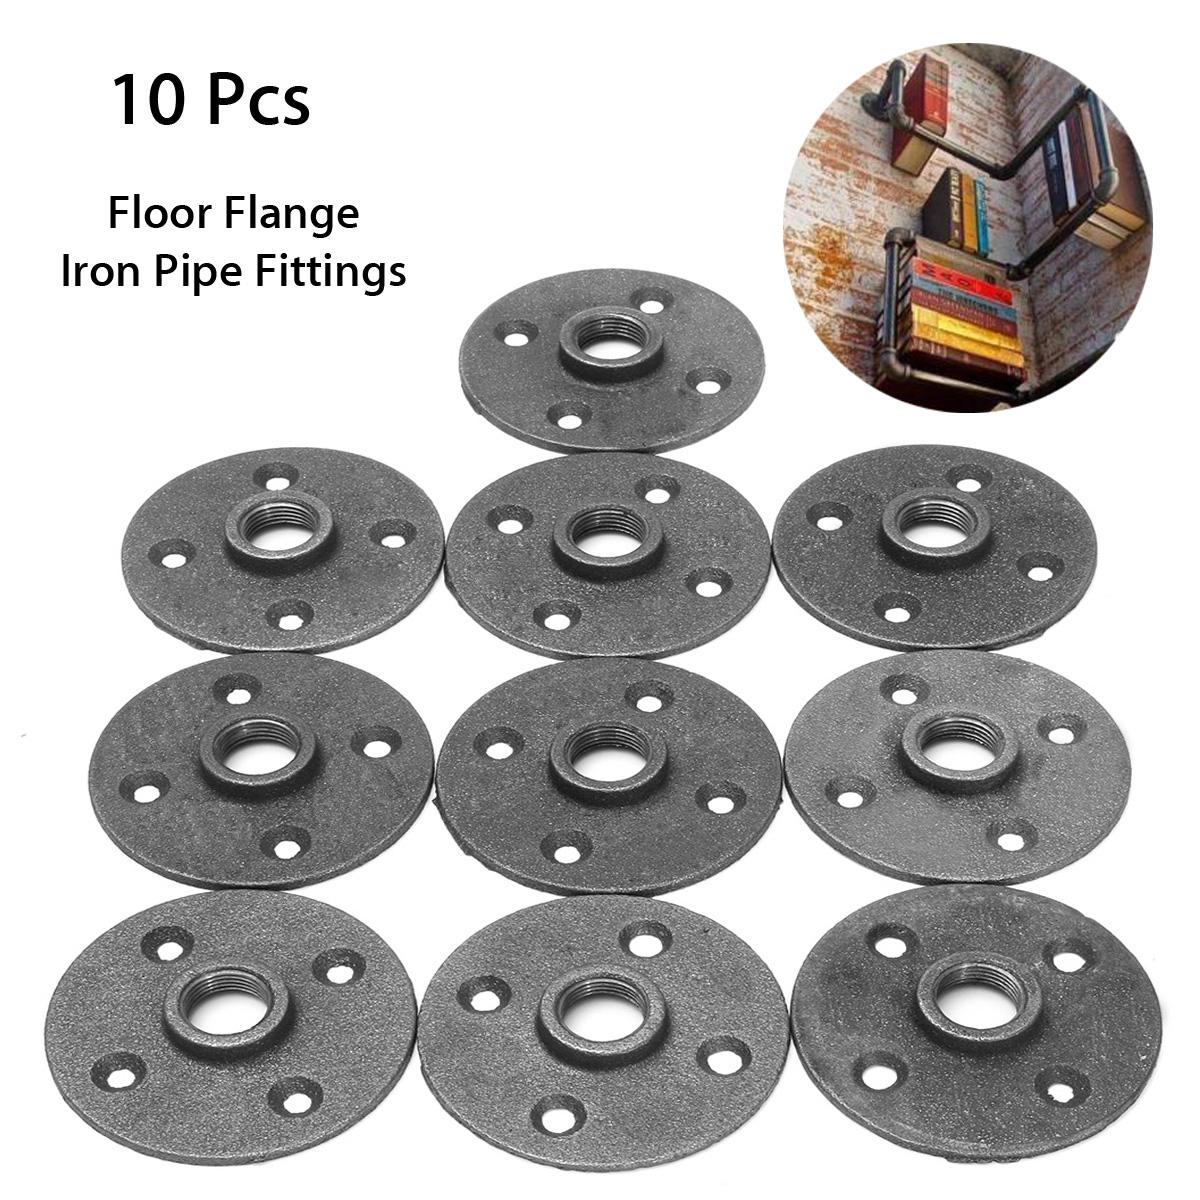 10pcs 1 2 black malleable threaded floor flange iron pipe for 1 in black malleable iron threaded floor flange